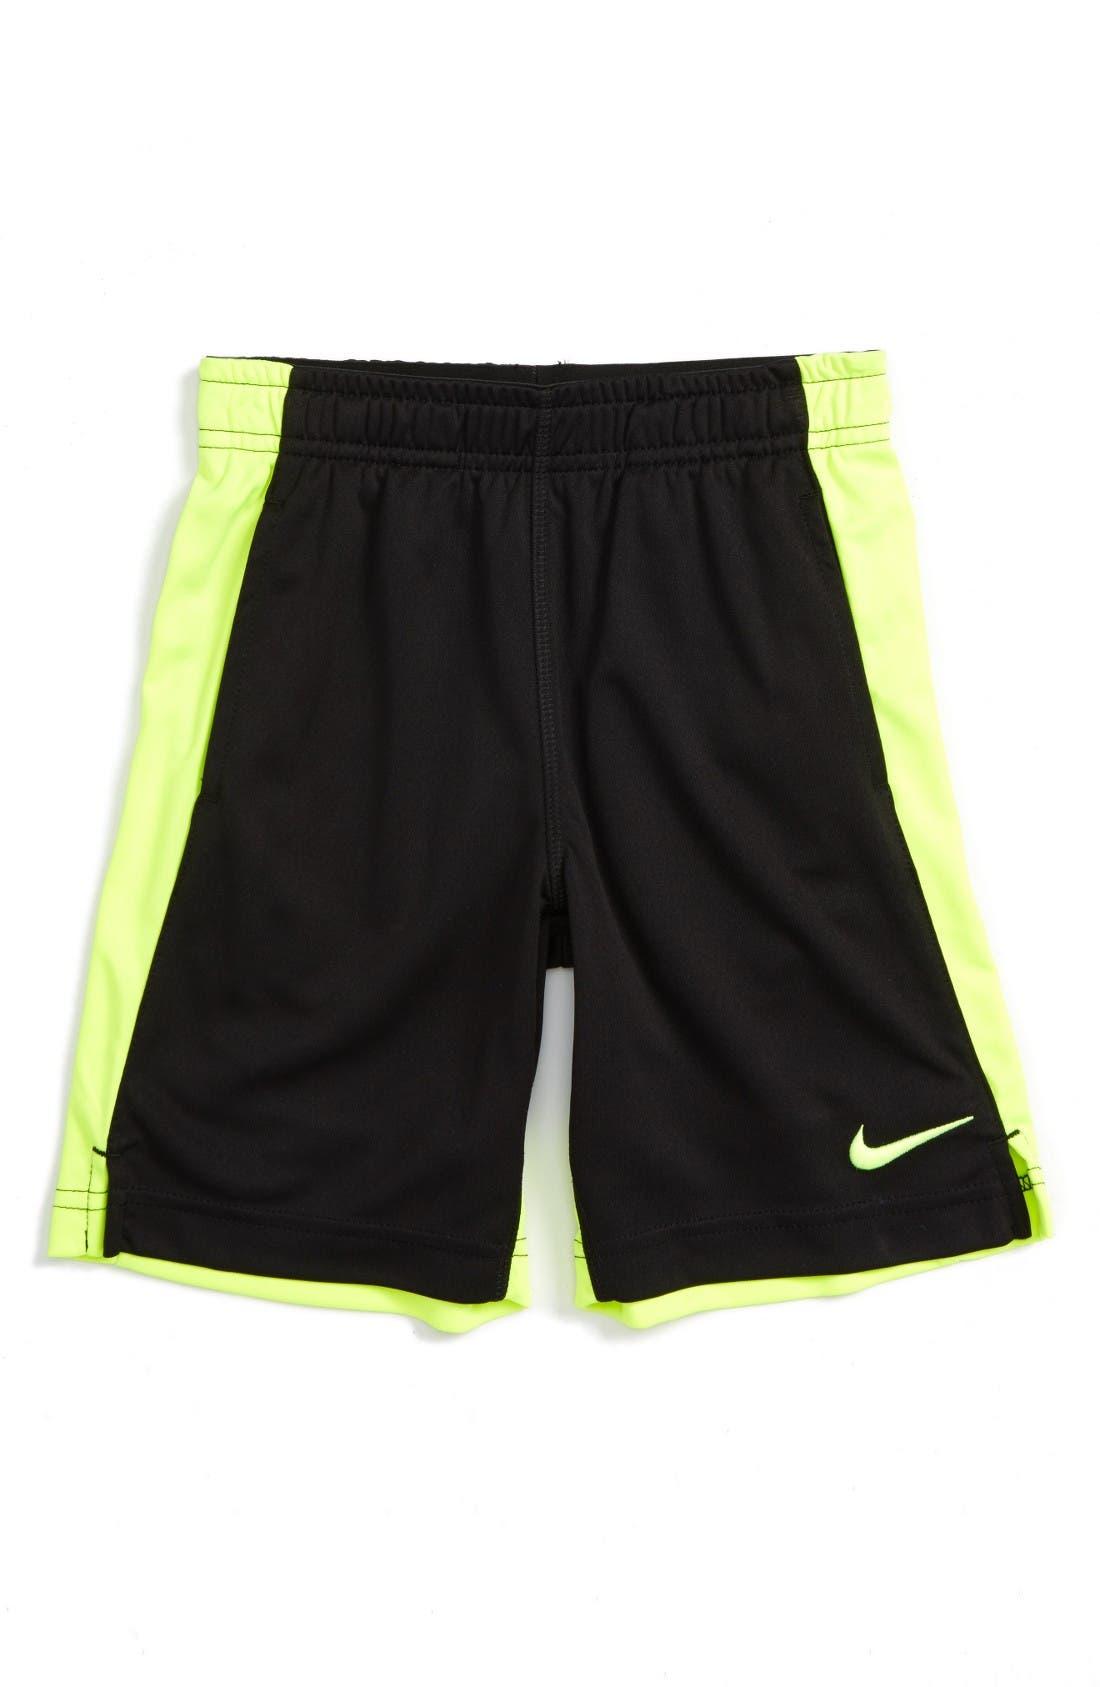 Dri-FIT Shorts,                         Main,                         color, Black